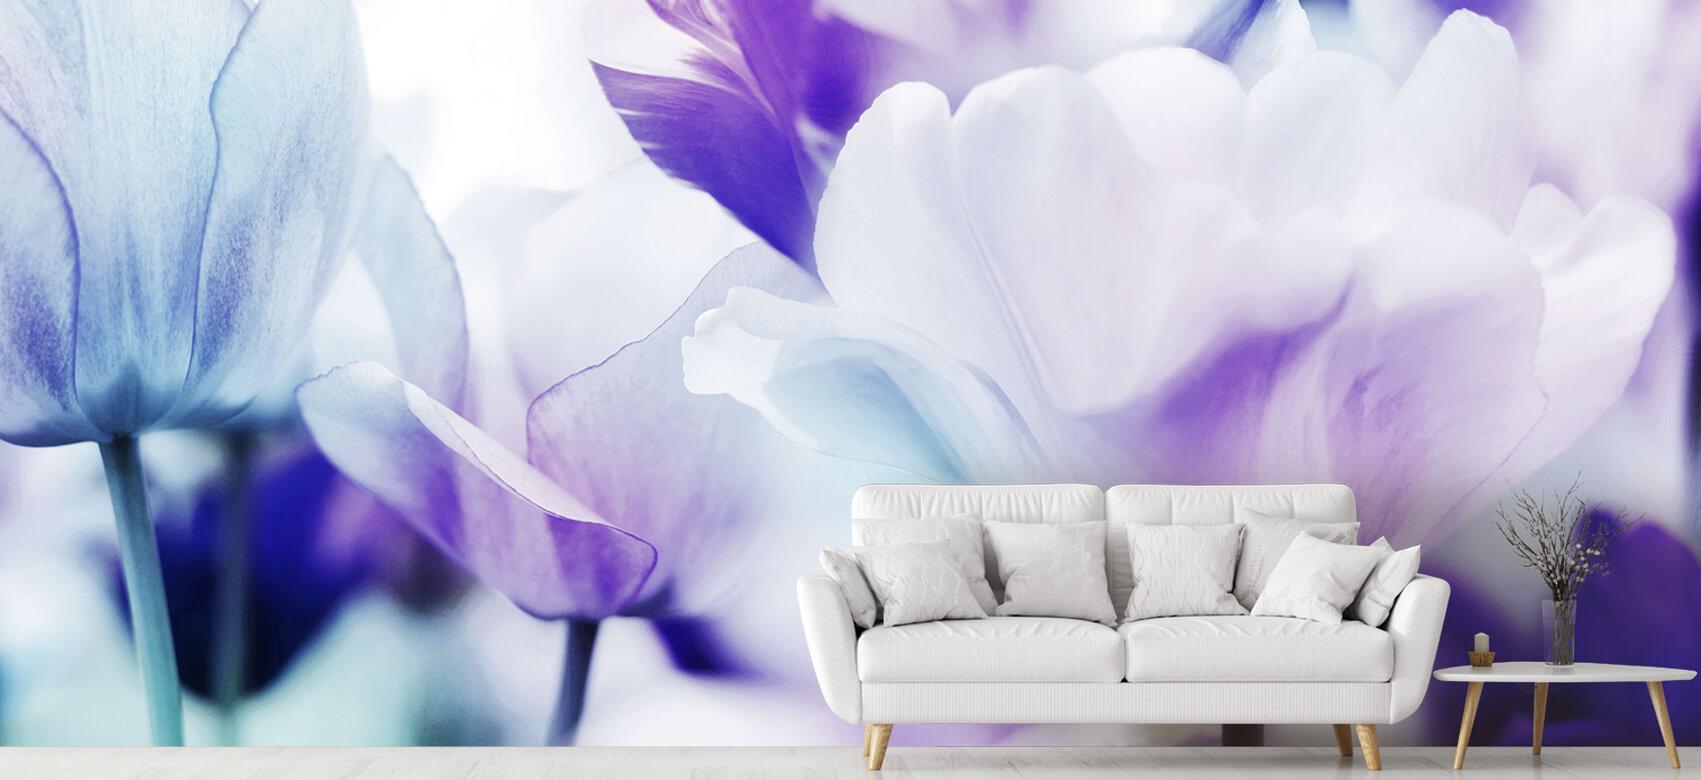 Bloemen, planten en bomen Tulpen fantasie 1